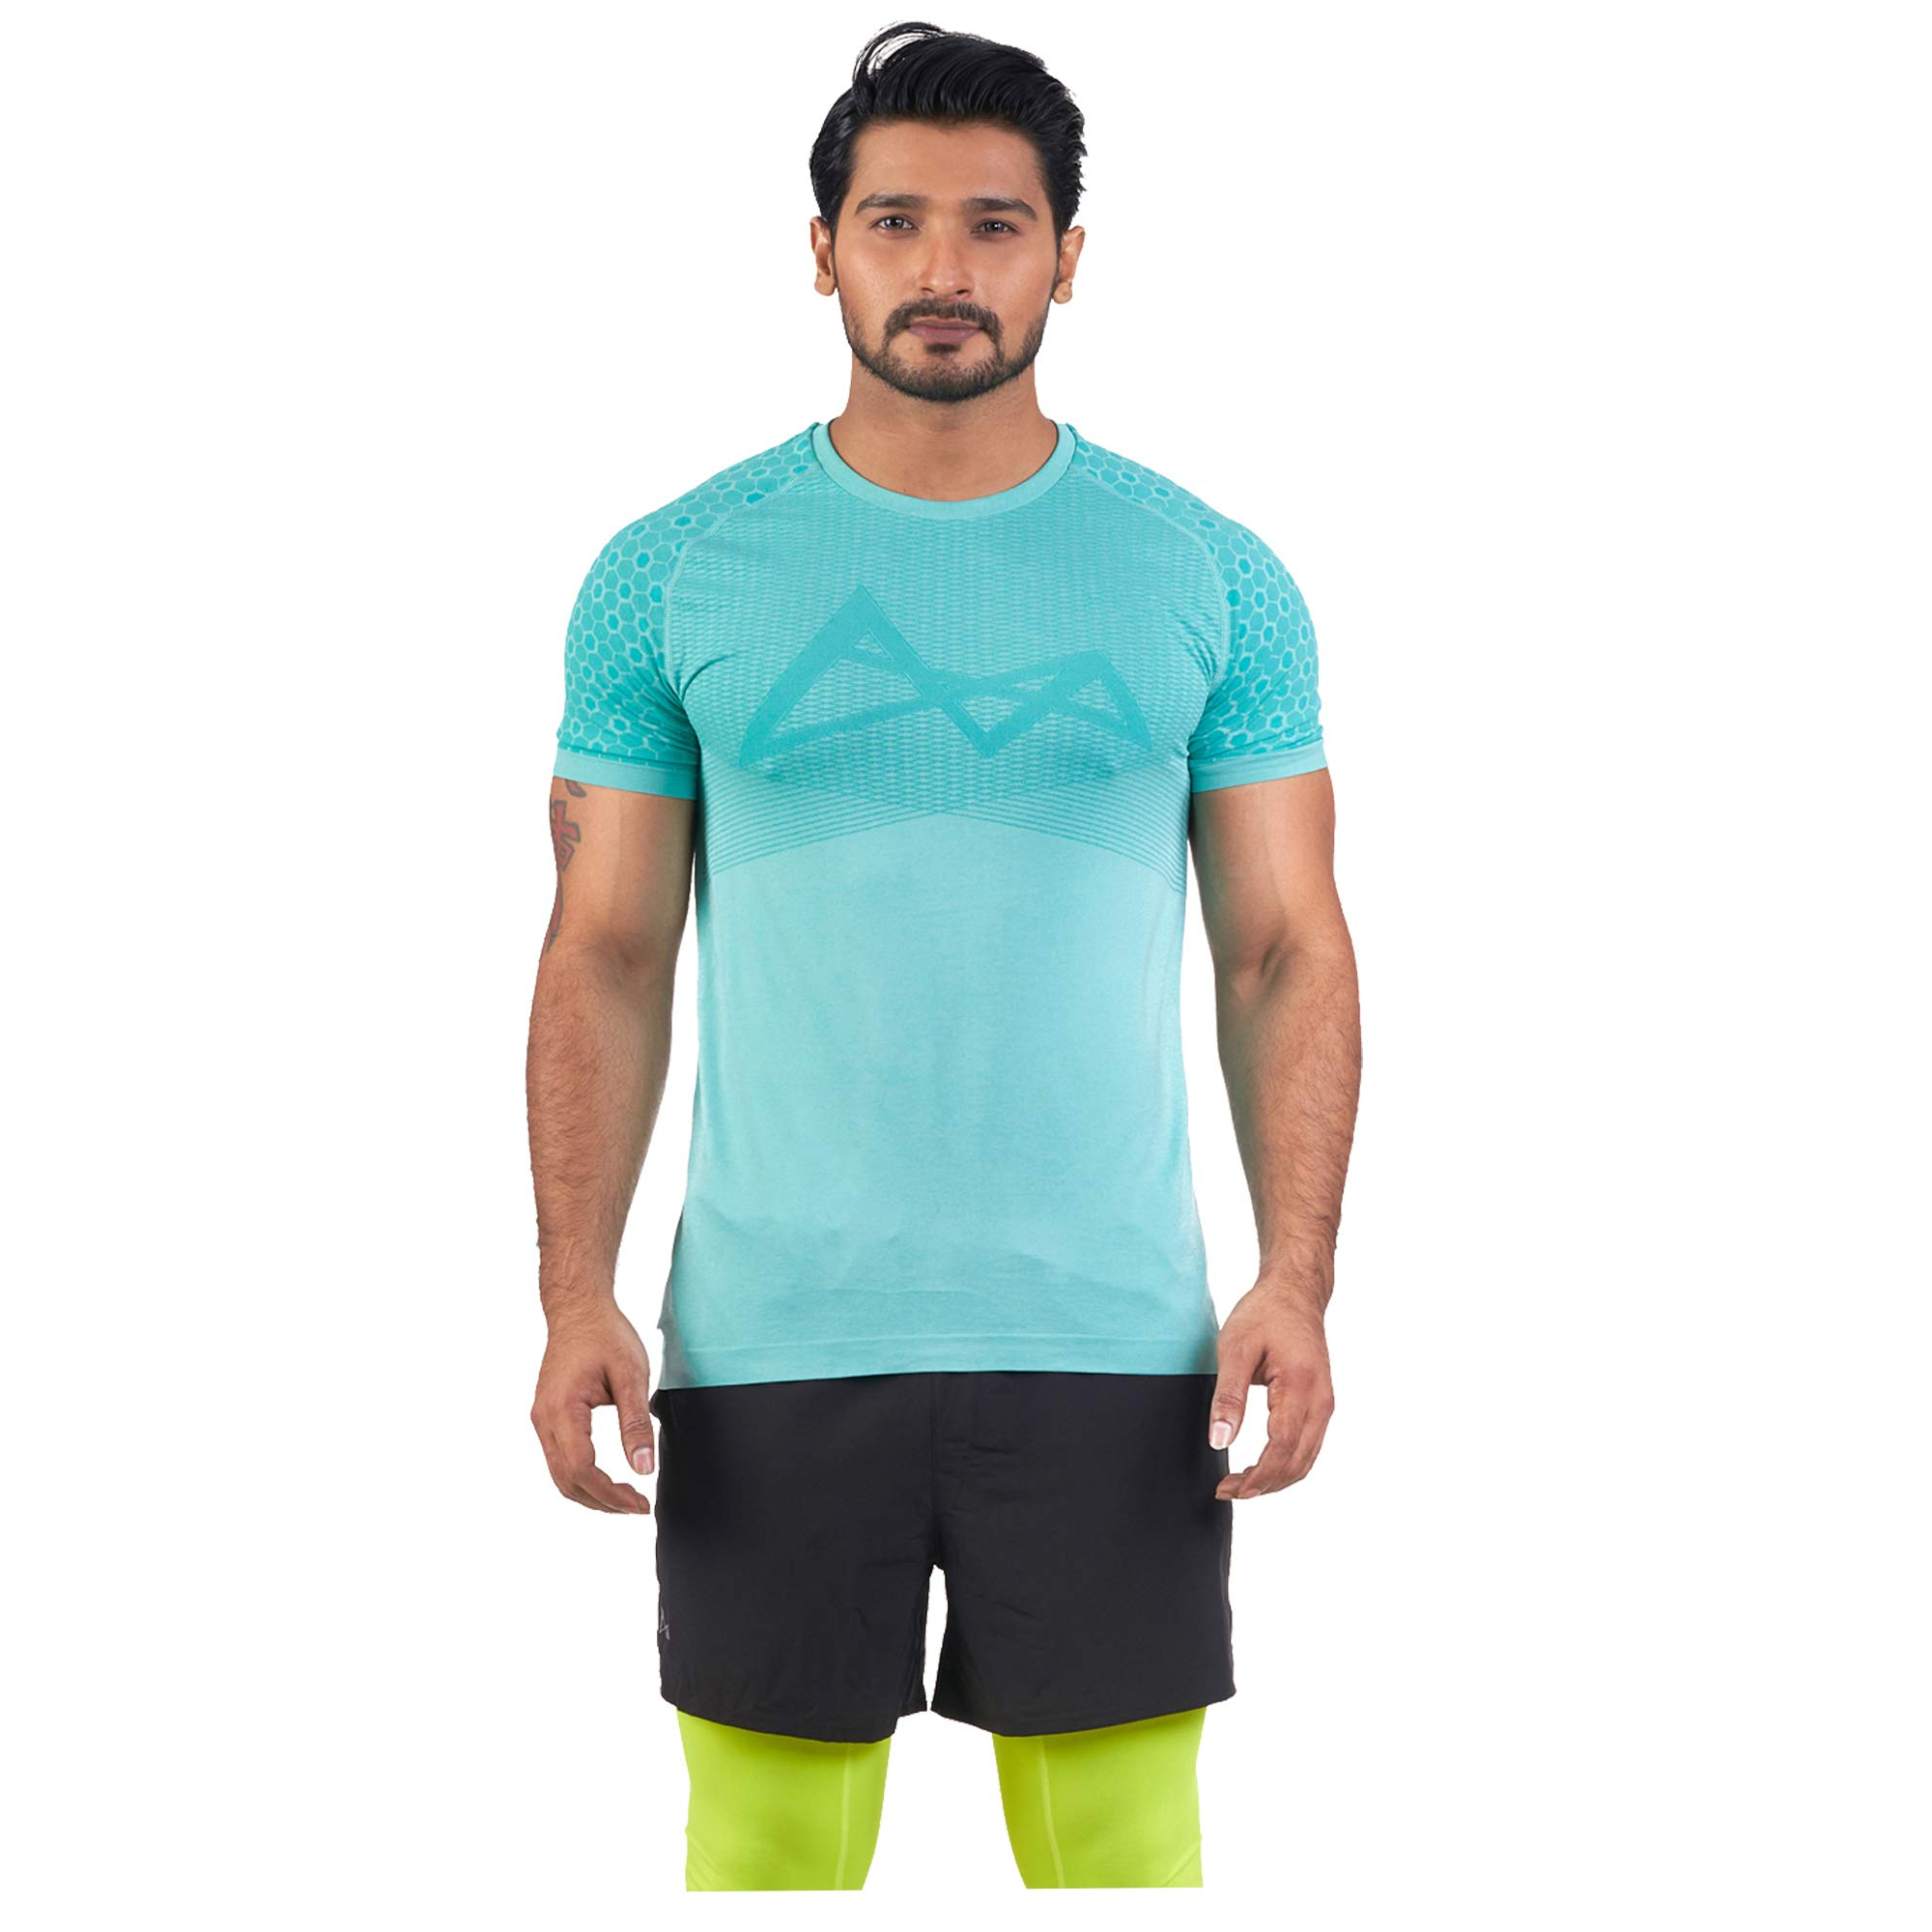 Turaag Men's Seamless Short Sleeve T-Shirt for Running, Training & Gym